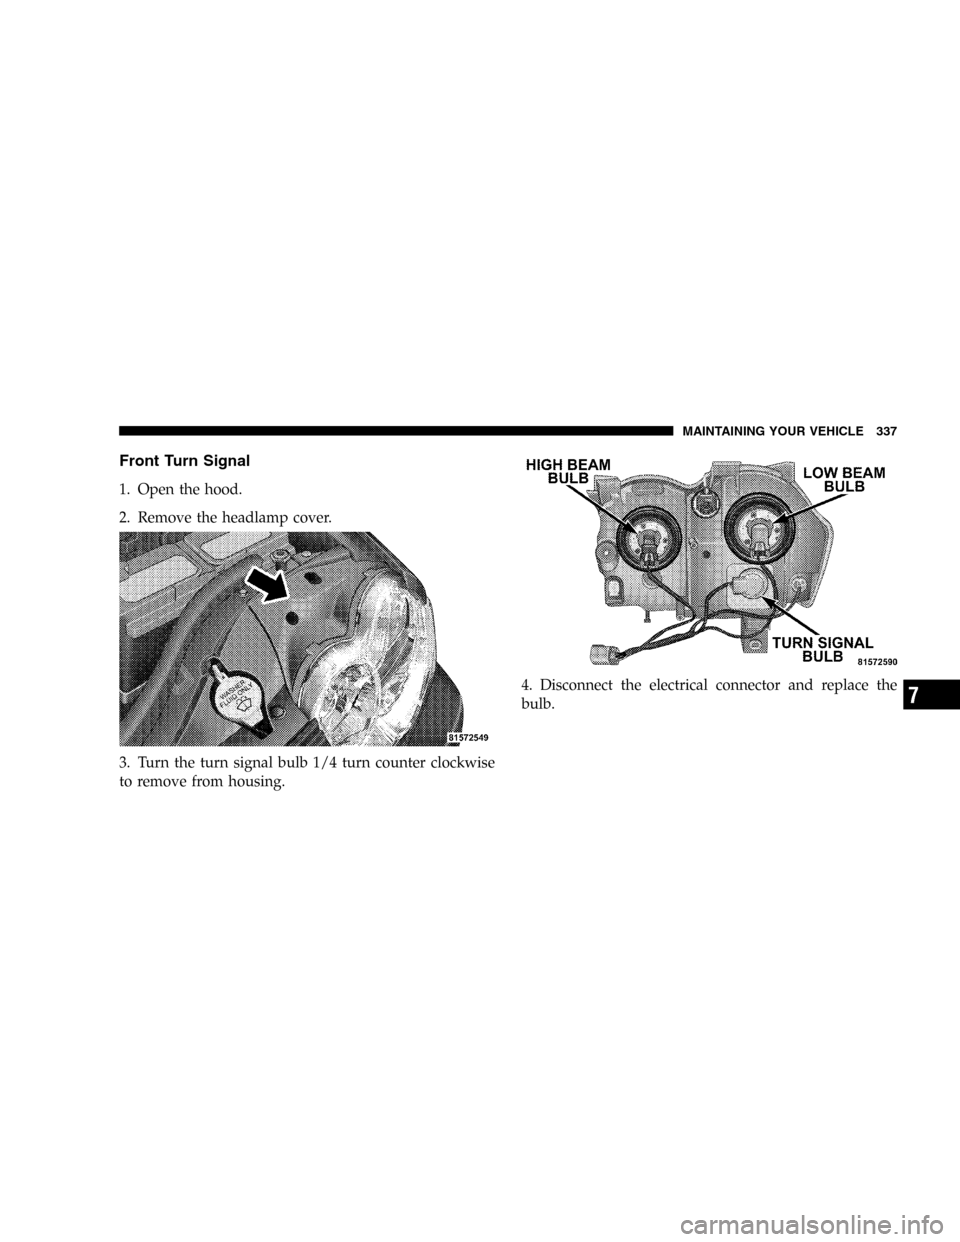 hight resolution of fuse box diagram 2006 jeep grand cherokee wk